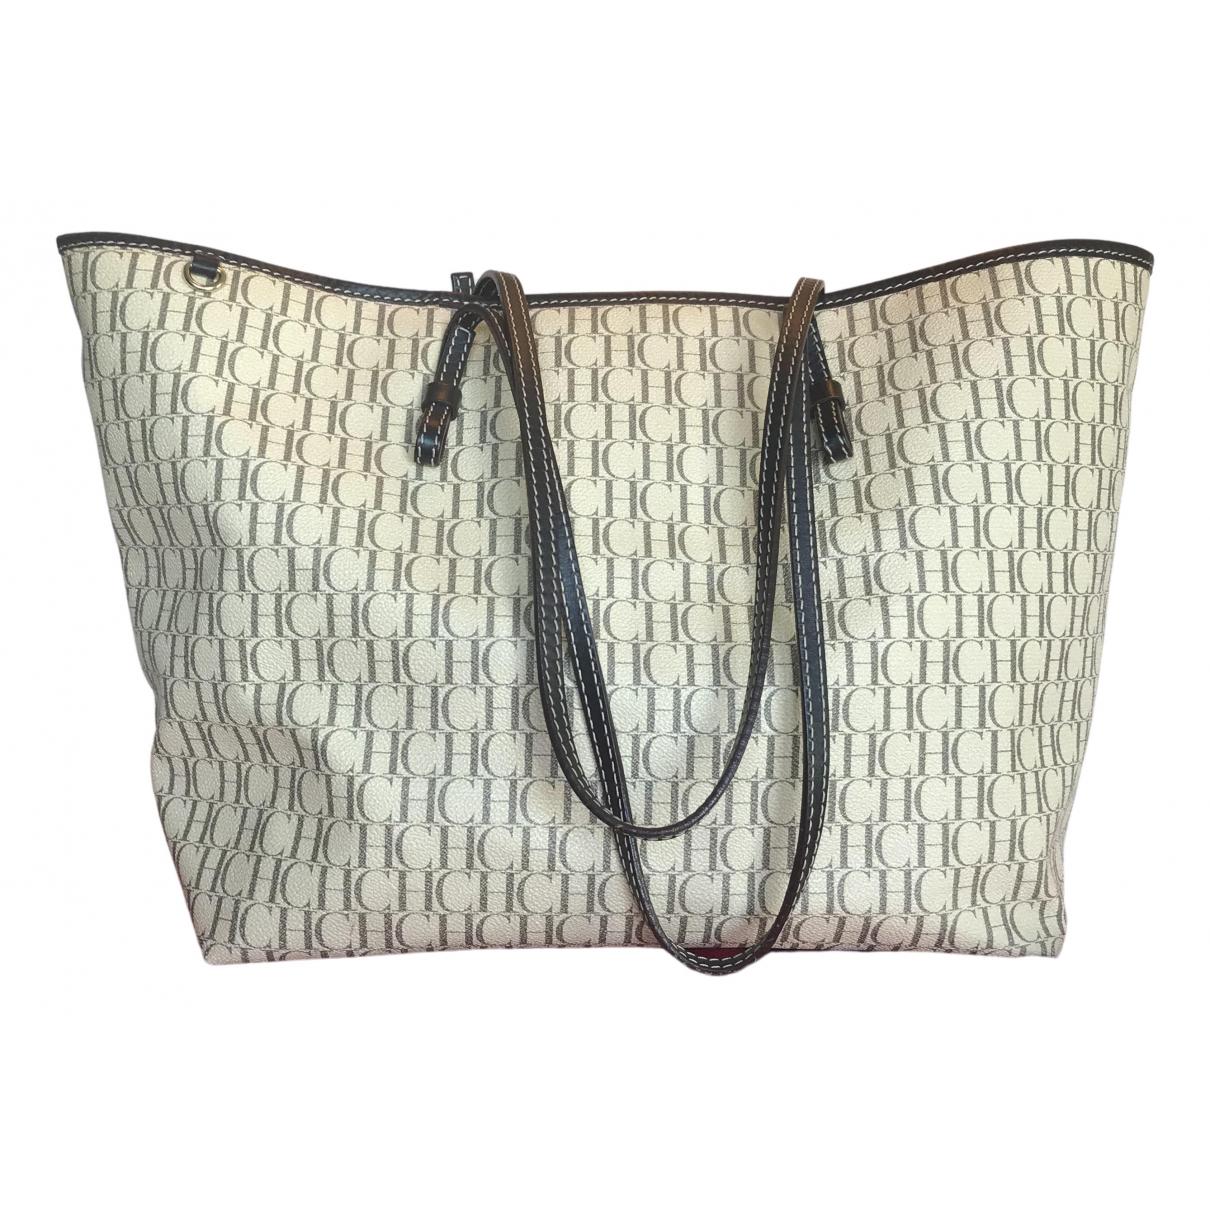 Carolina Herrera \N Beige Leather handbag for Women \N